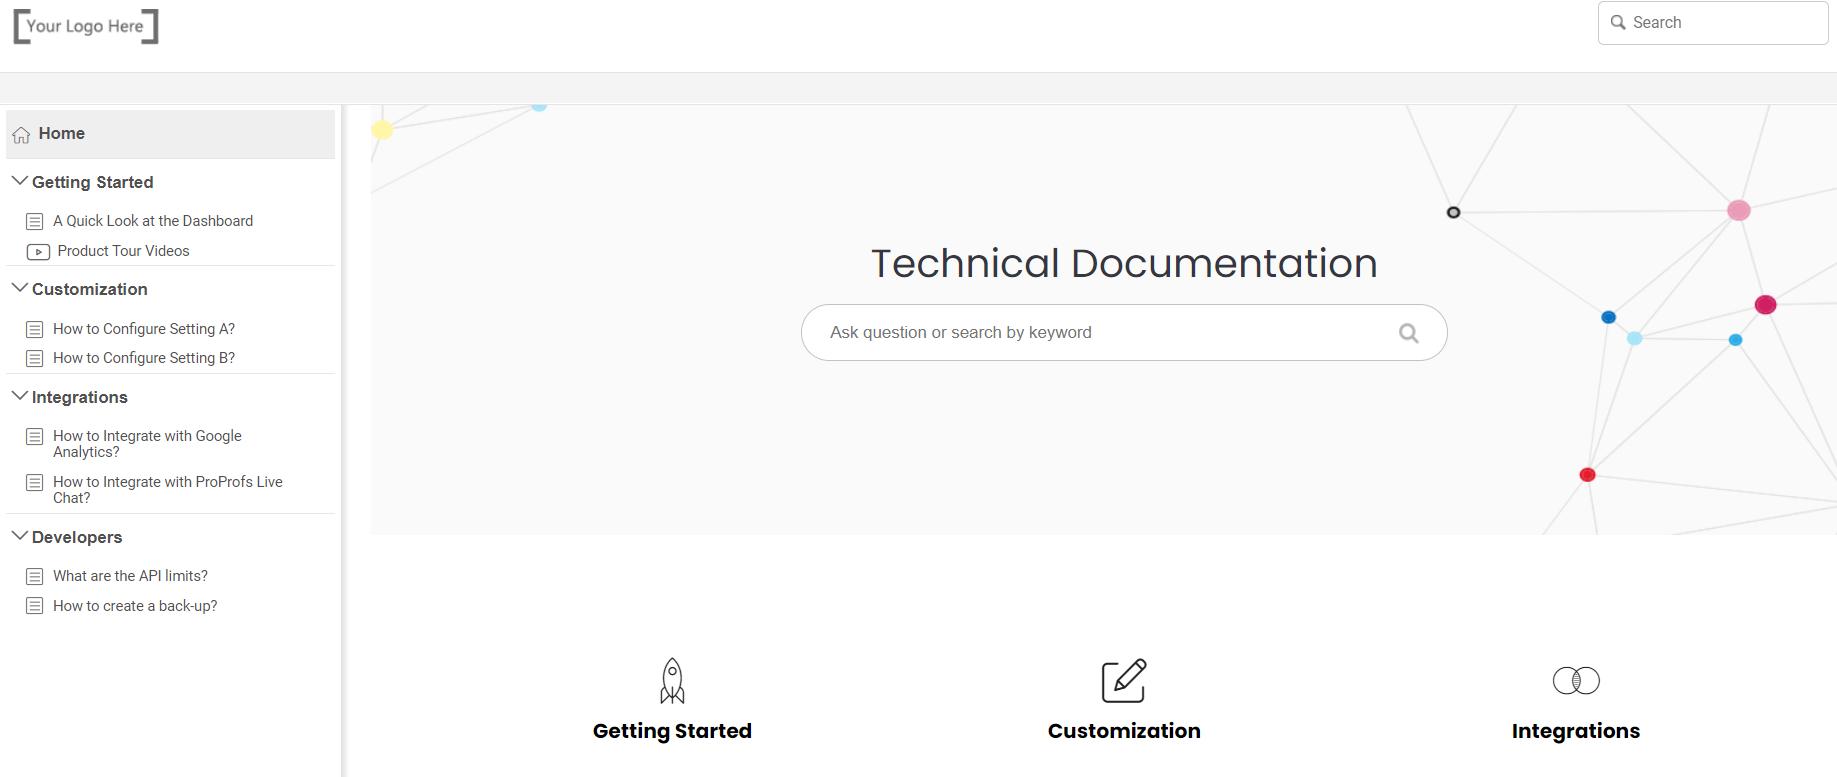 Free online technical documentation